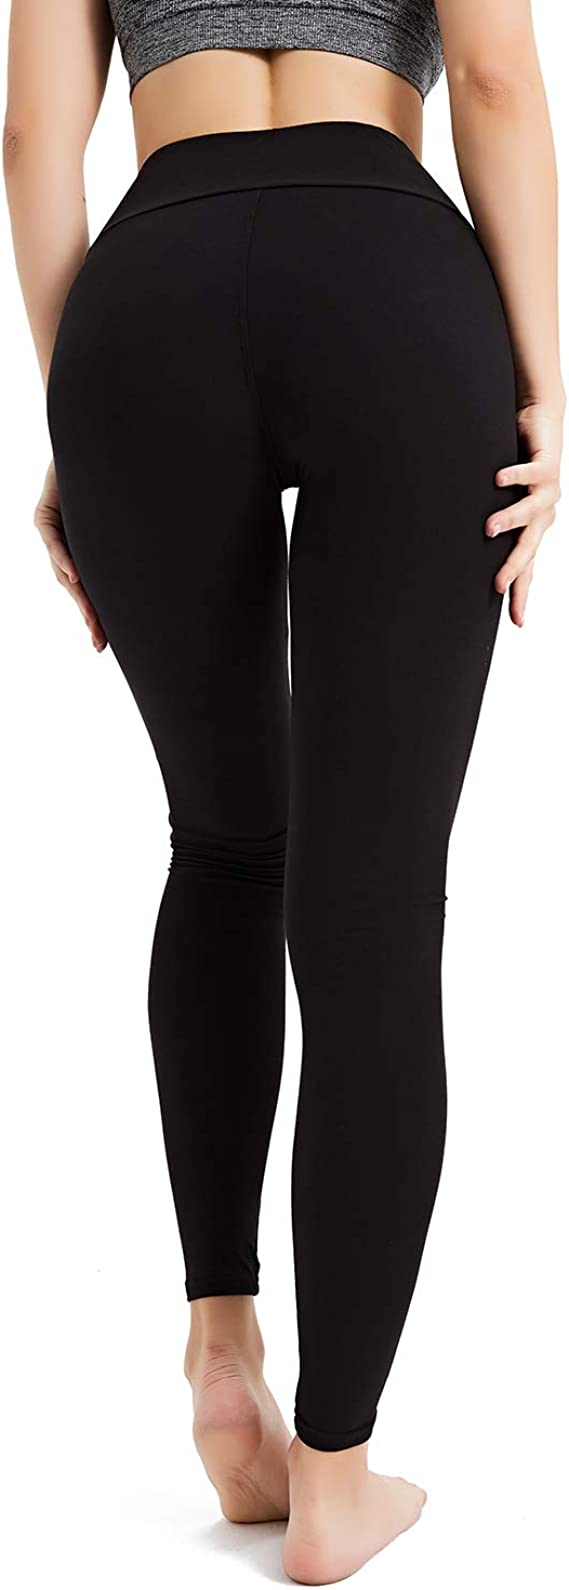 Blickdichte Sport Leggins f/ür Damen Yoga Tights 2 St/ück//Packung Sporthose Lang Yogahosen StarLifey Leggings Damen